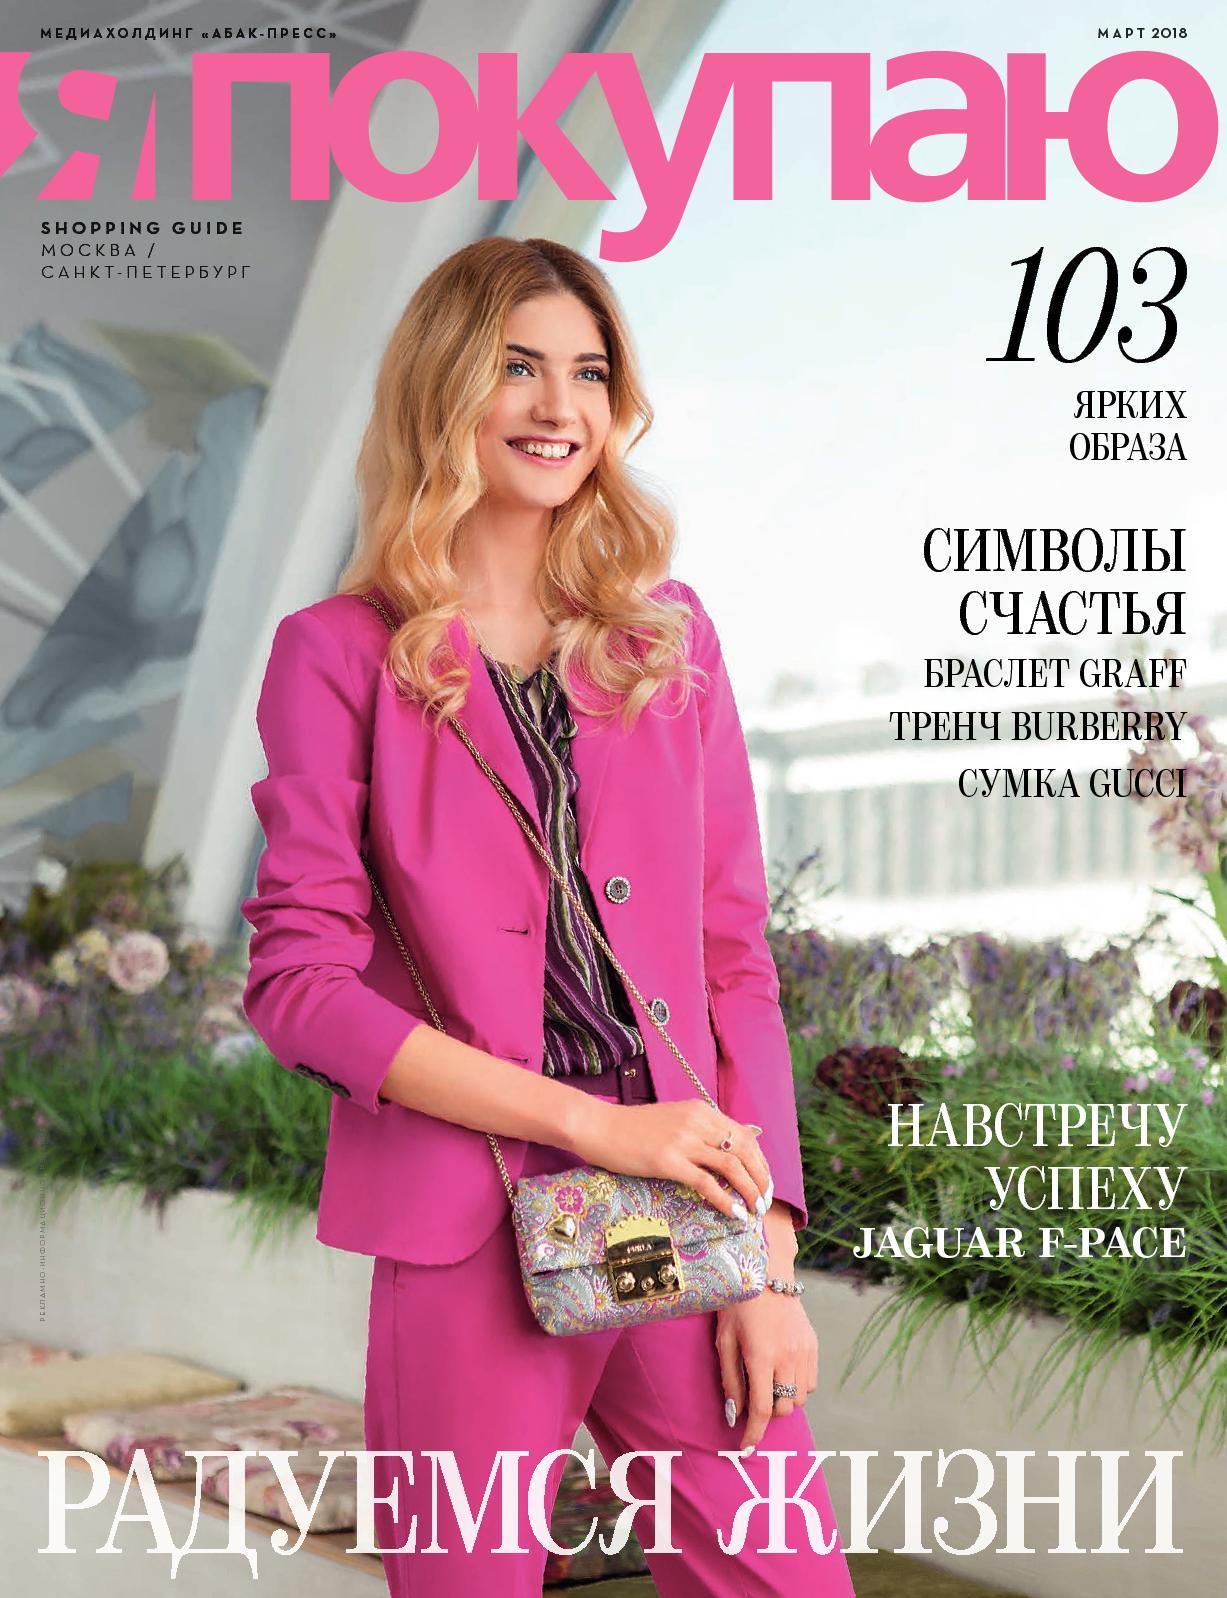 Shopping Guide «Я Покупаю. Москва - Санкт-Петербург», март 2018